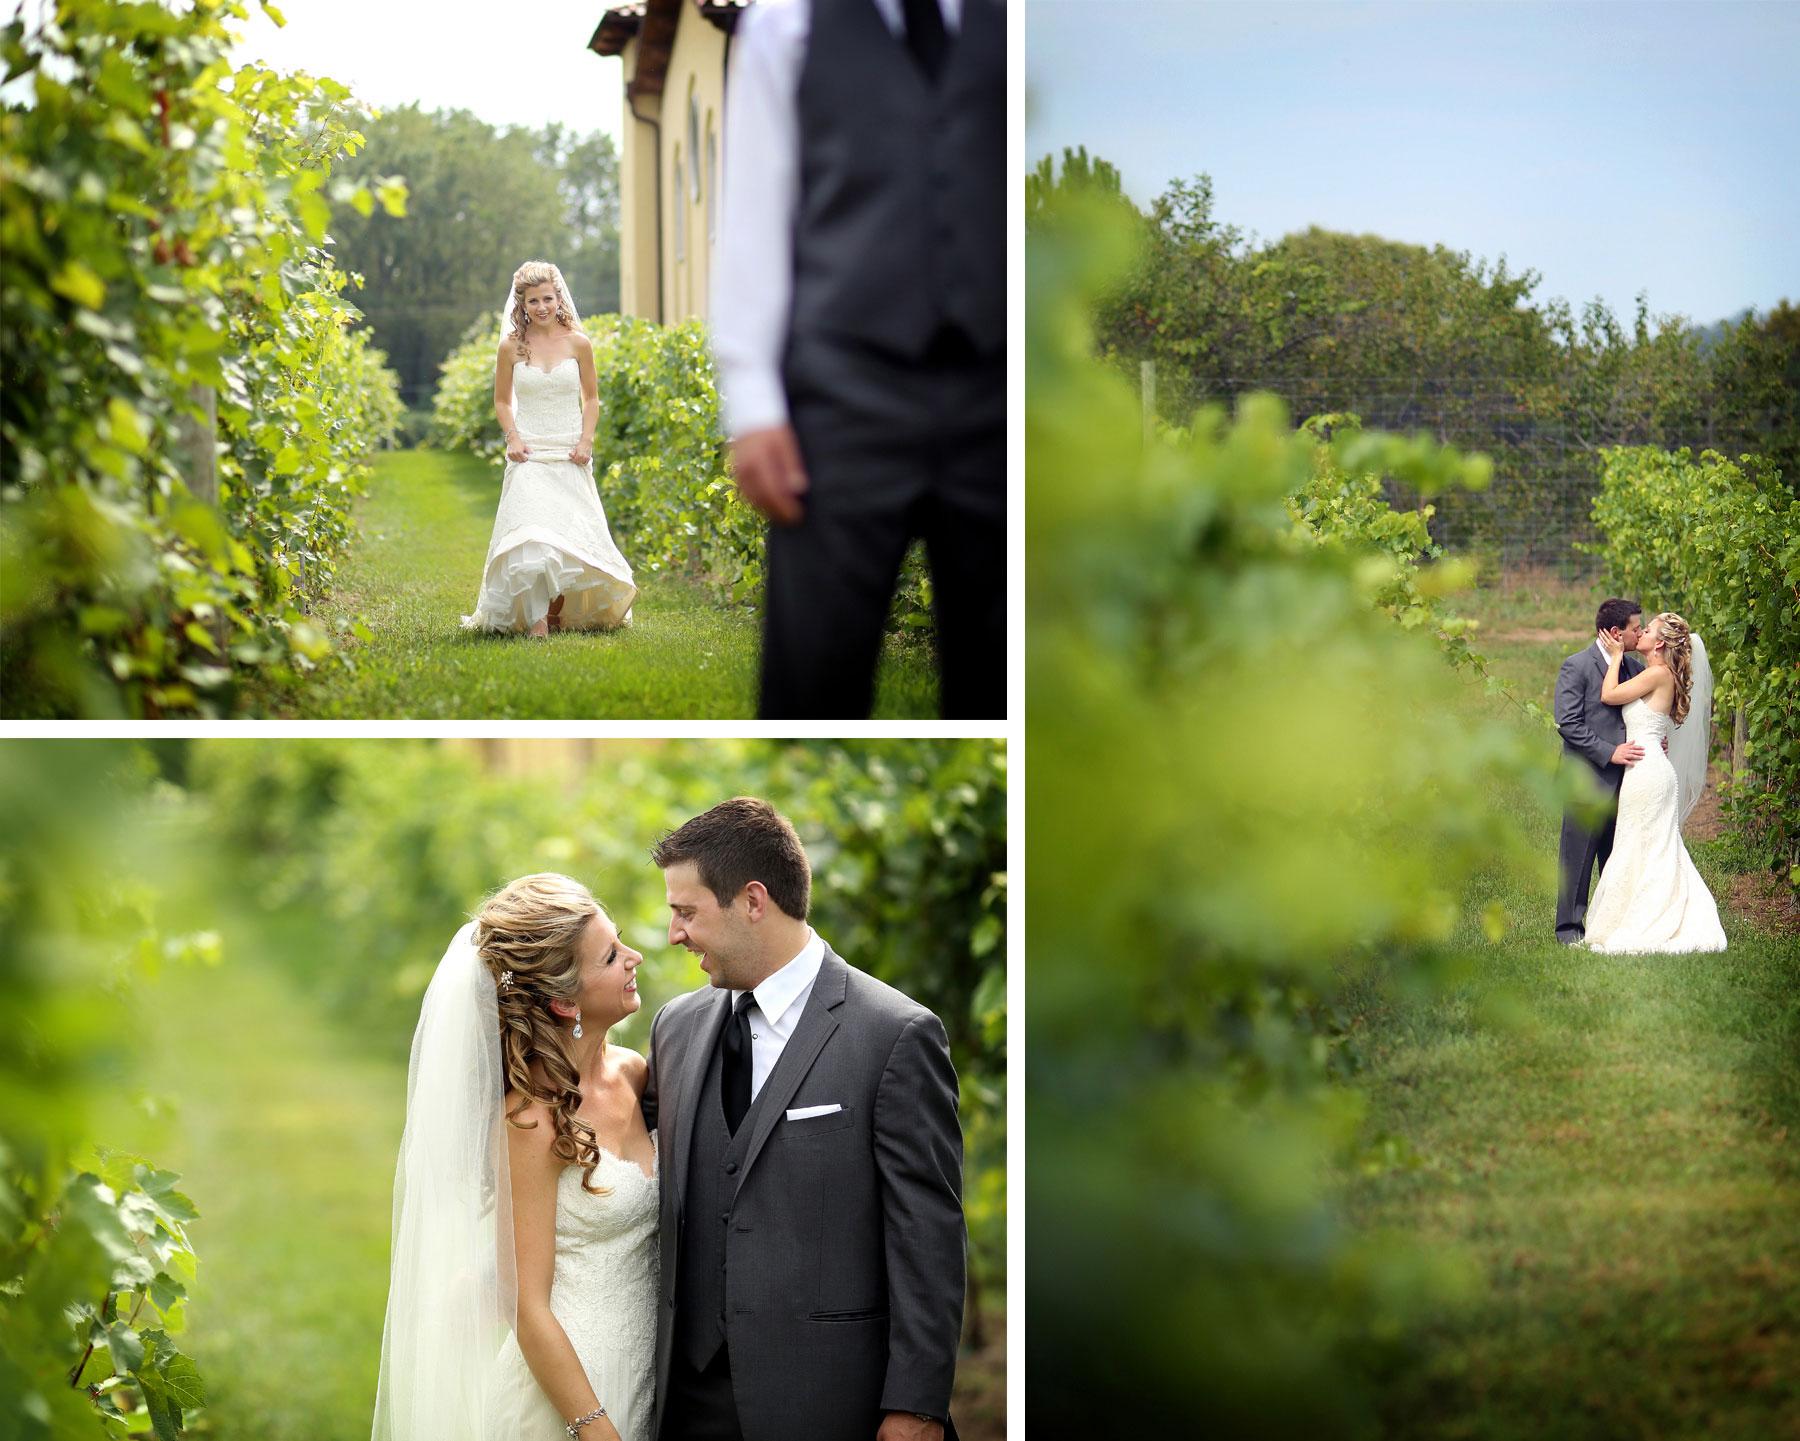 02-Lake-Pepin-Wisconsin-Wedding-Photography-by-Vick-Photography-Villa-Bellezza-Vineyard-Winery-First-Look-Emily-&-Sam.jpg